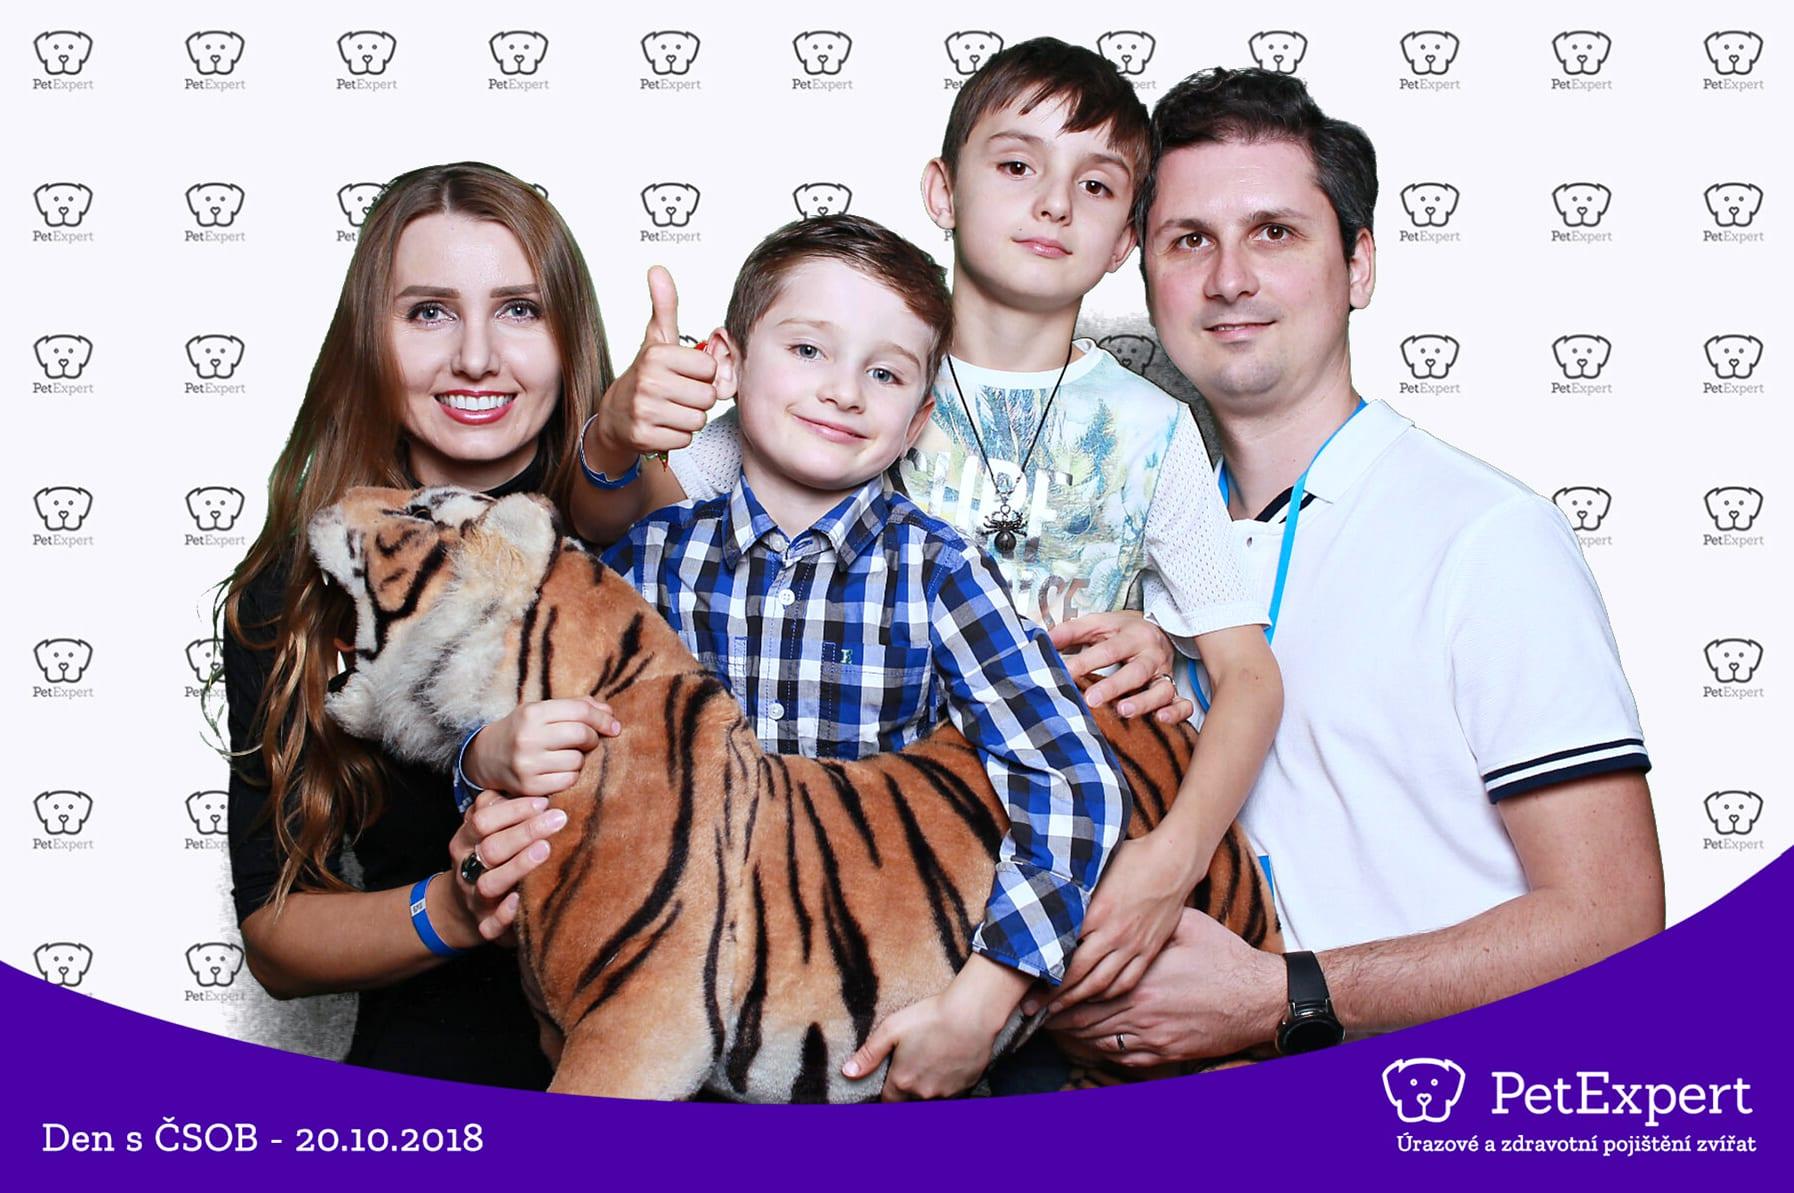 fotokoutek-petexpert-20-10-2018-507621